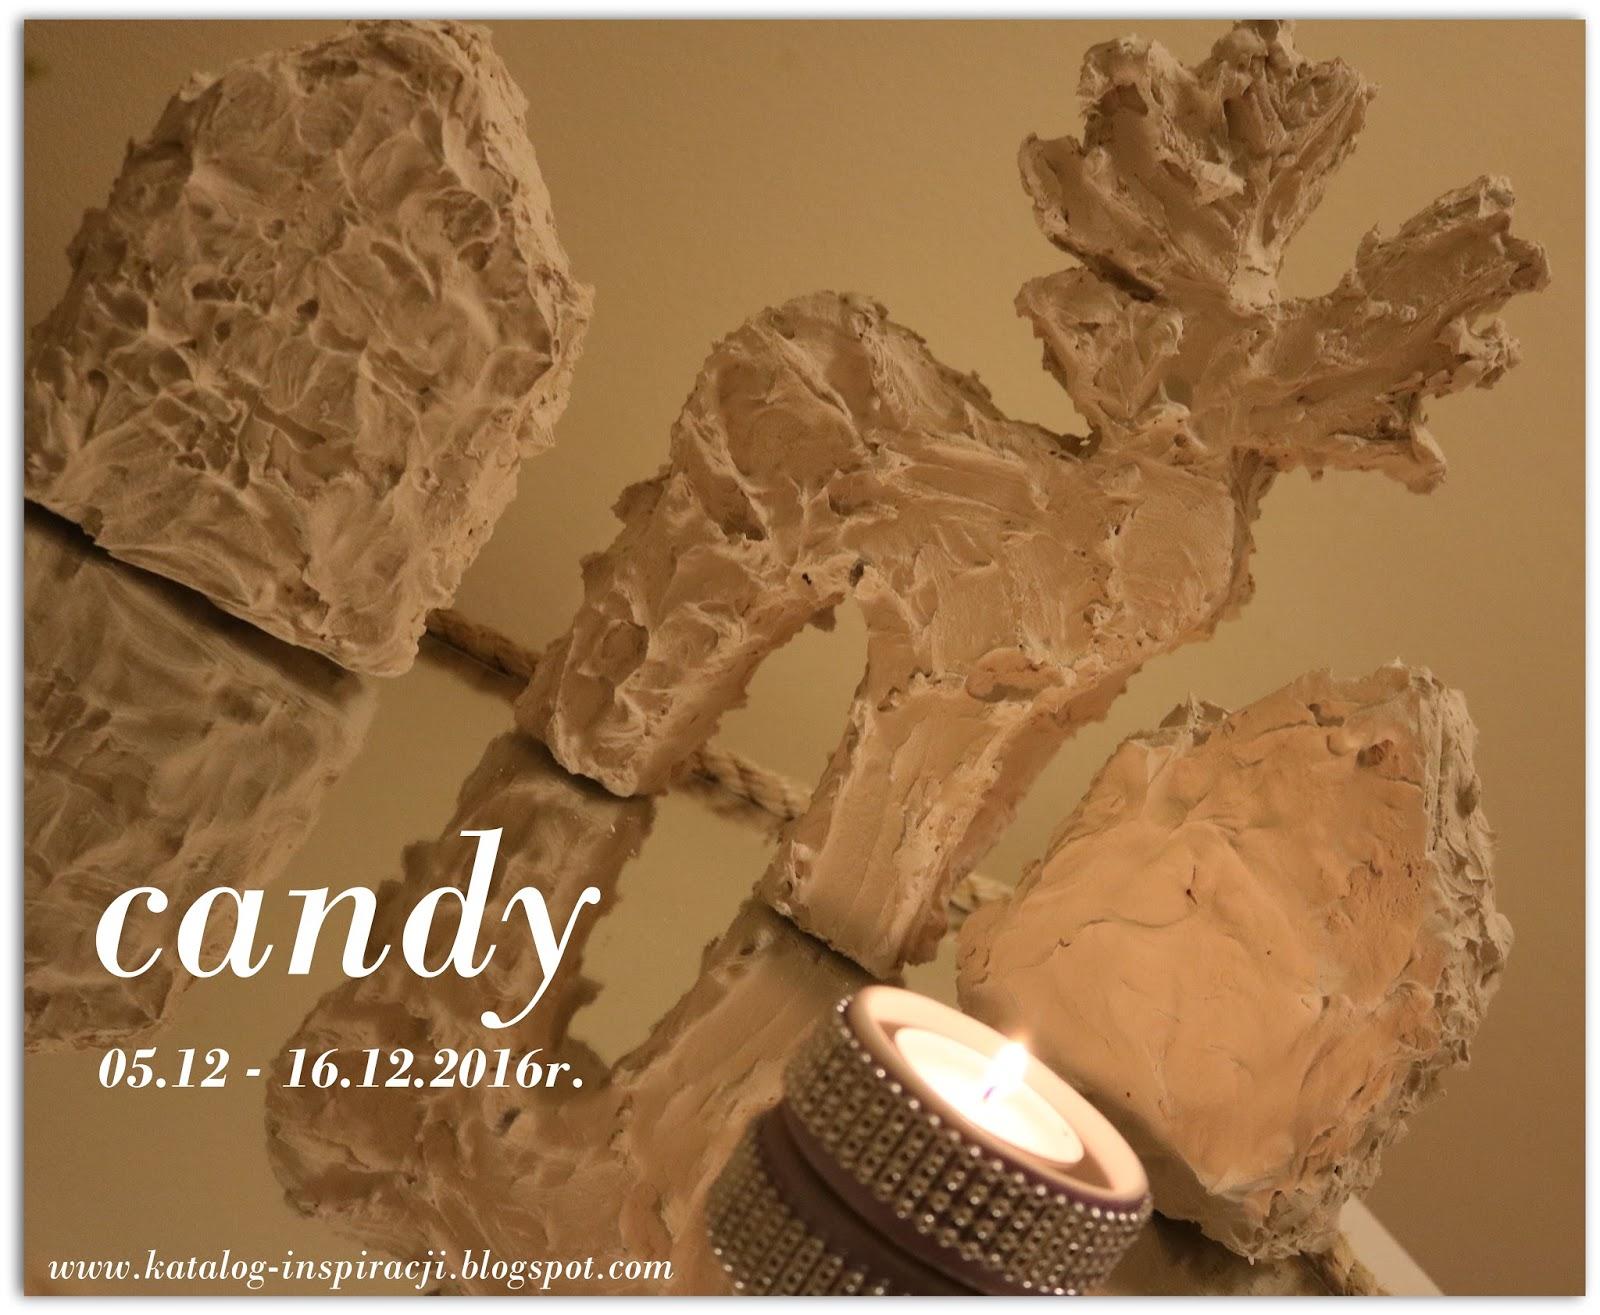 Candy Katalog Inspiracji